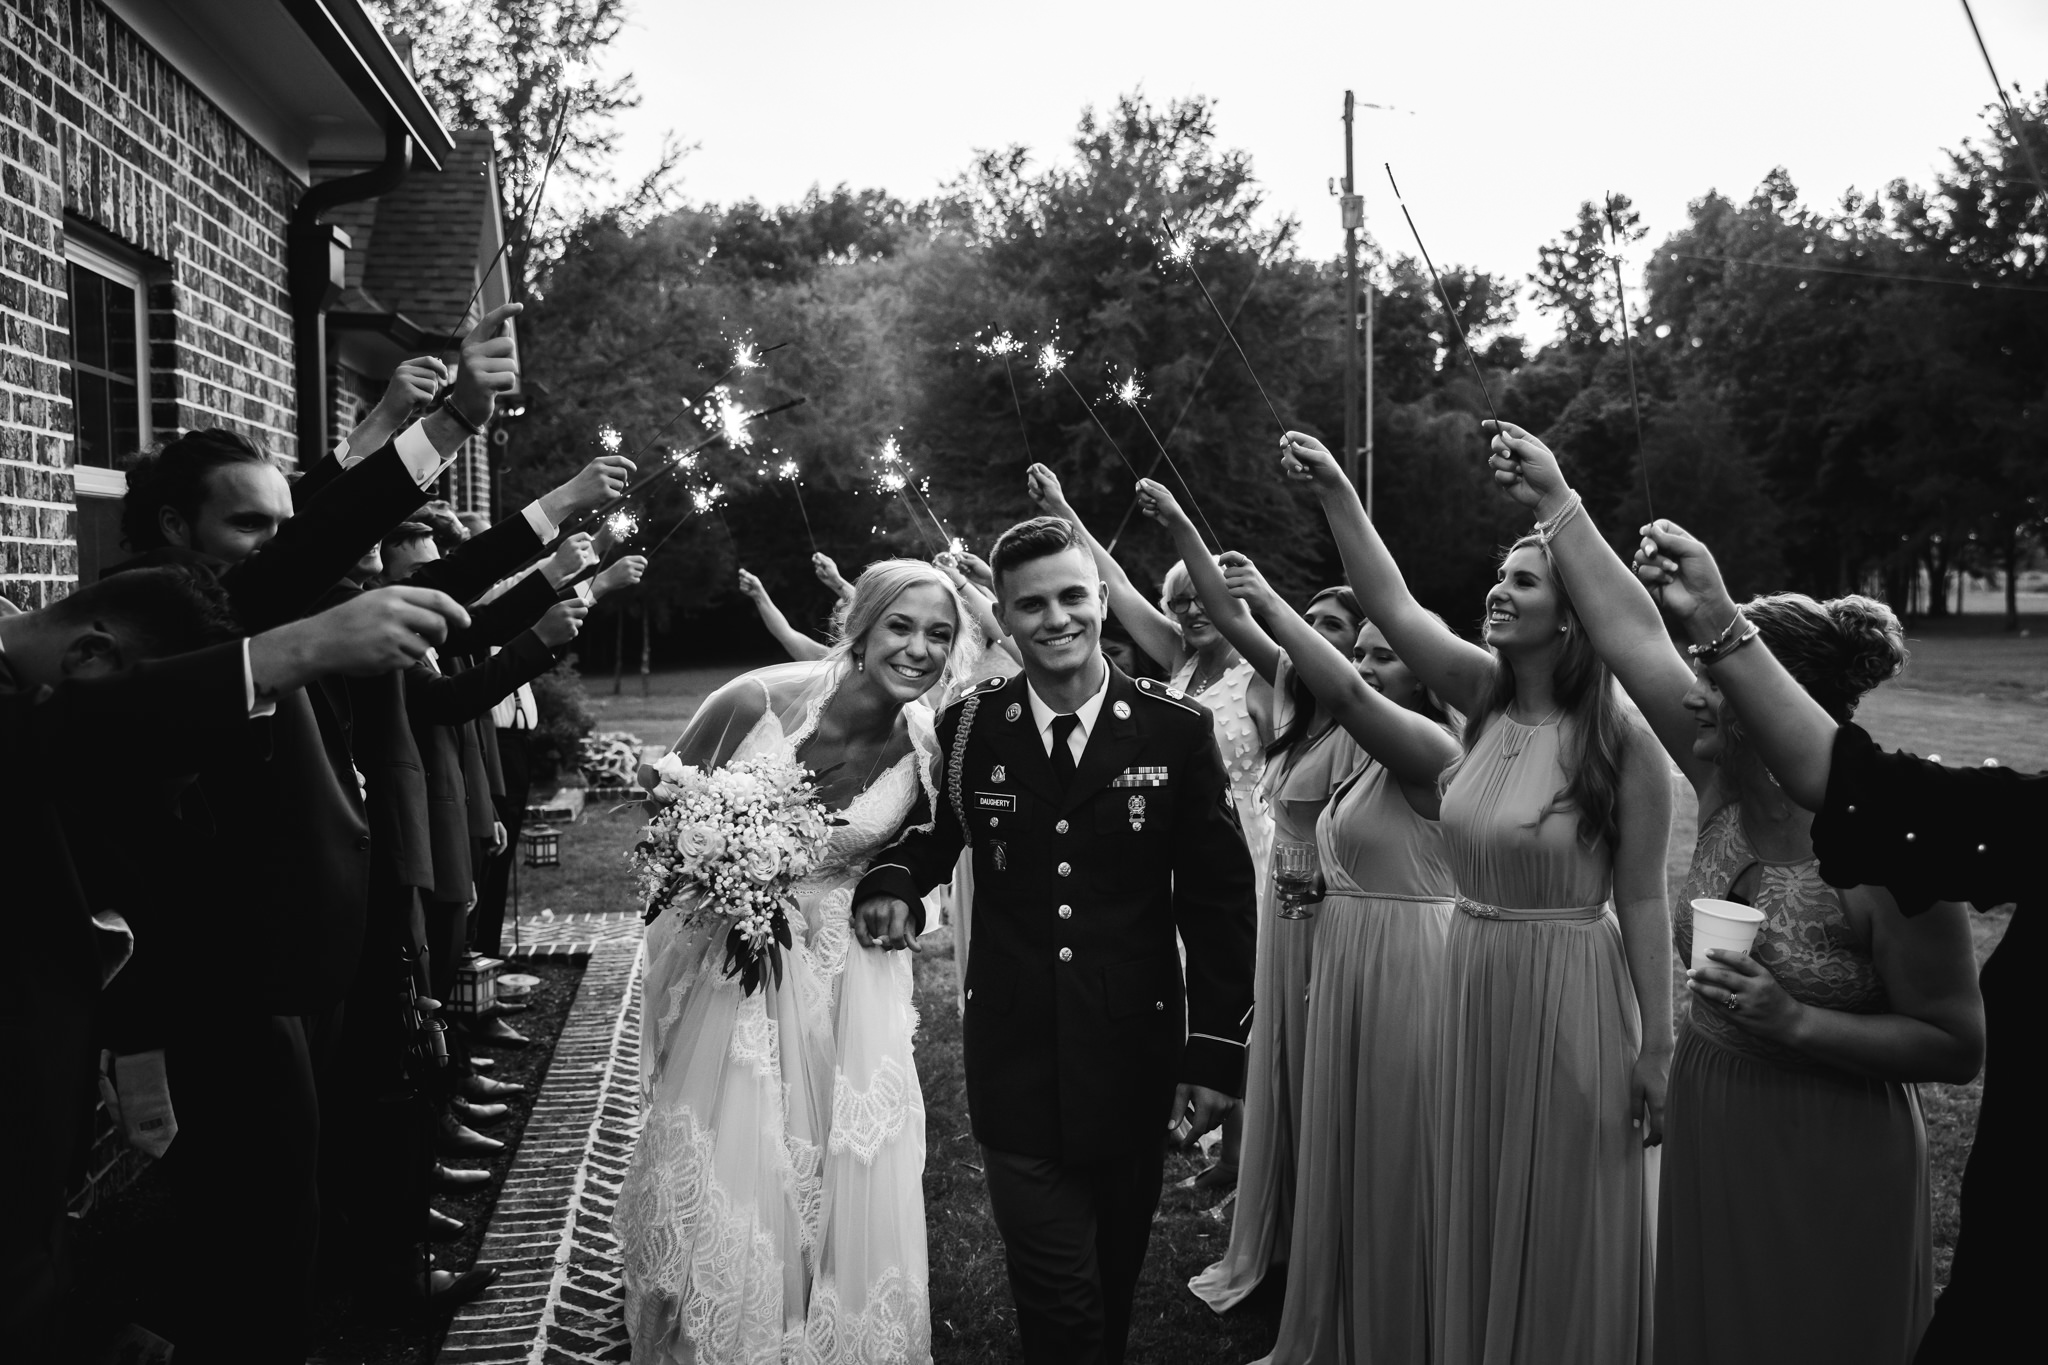 backyard-wedding-thewarmtharoundyou-lexy-branson-9-2.jpg